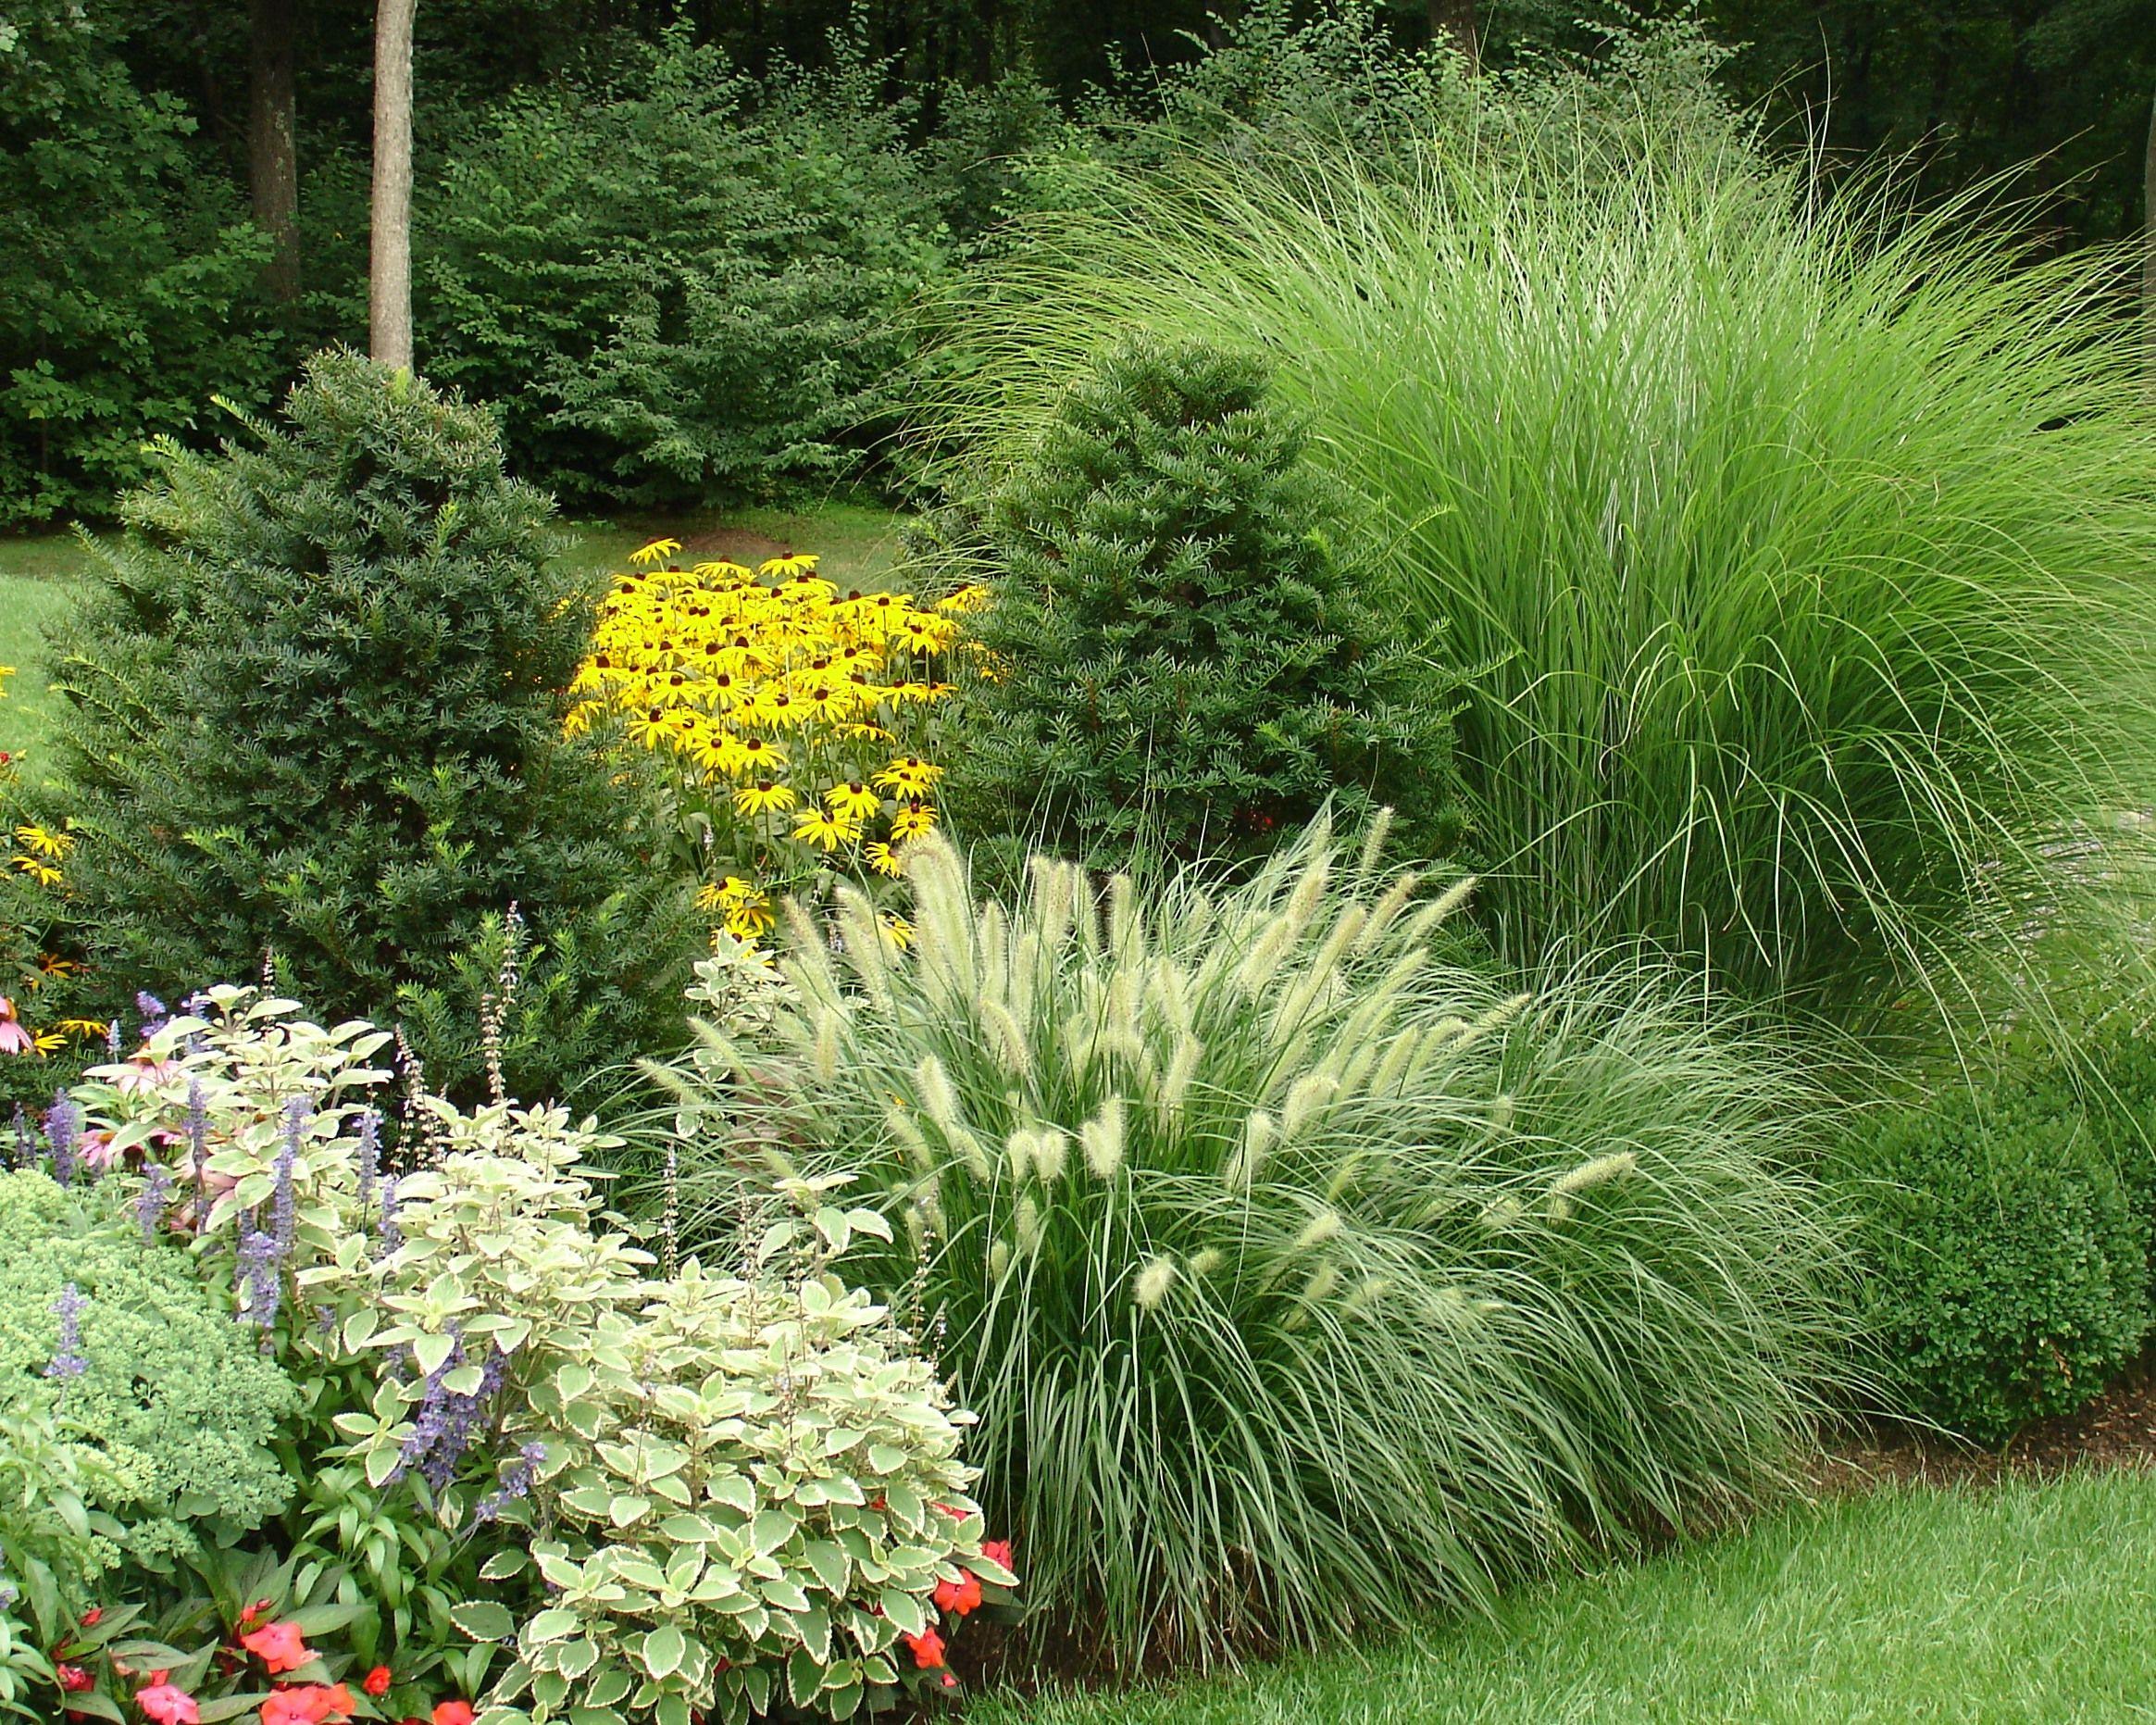 Pin By Angelina De Simone On Johnsen Landscapes Pools Evergreen Landscape Grasses Landscaping Diy Backyard Landscaping